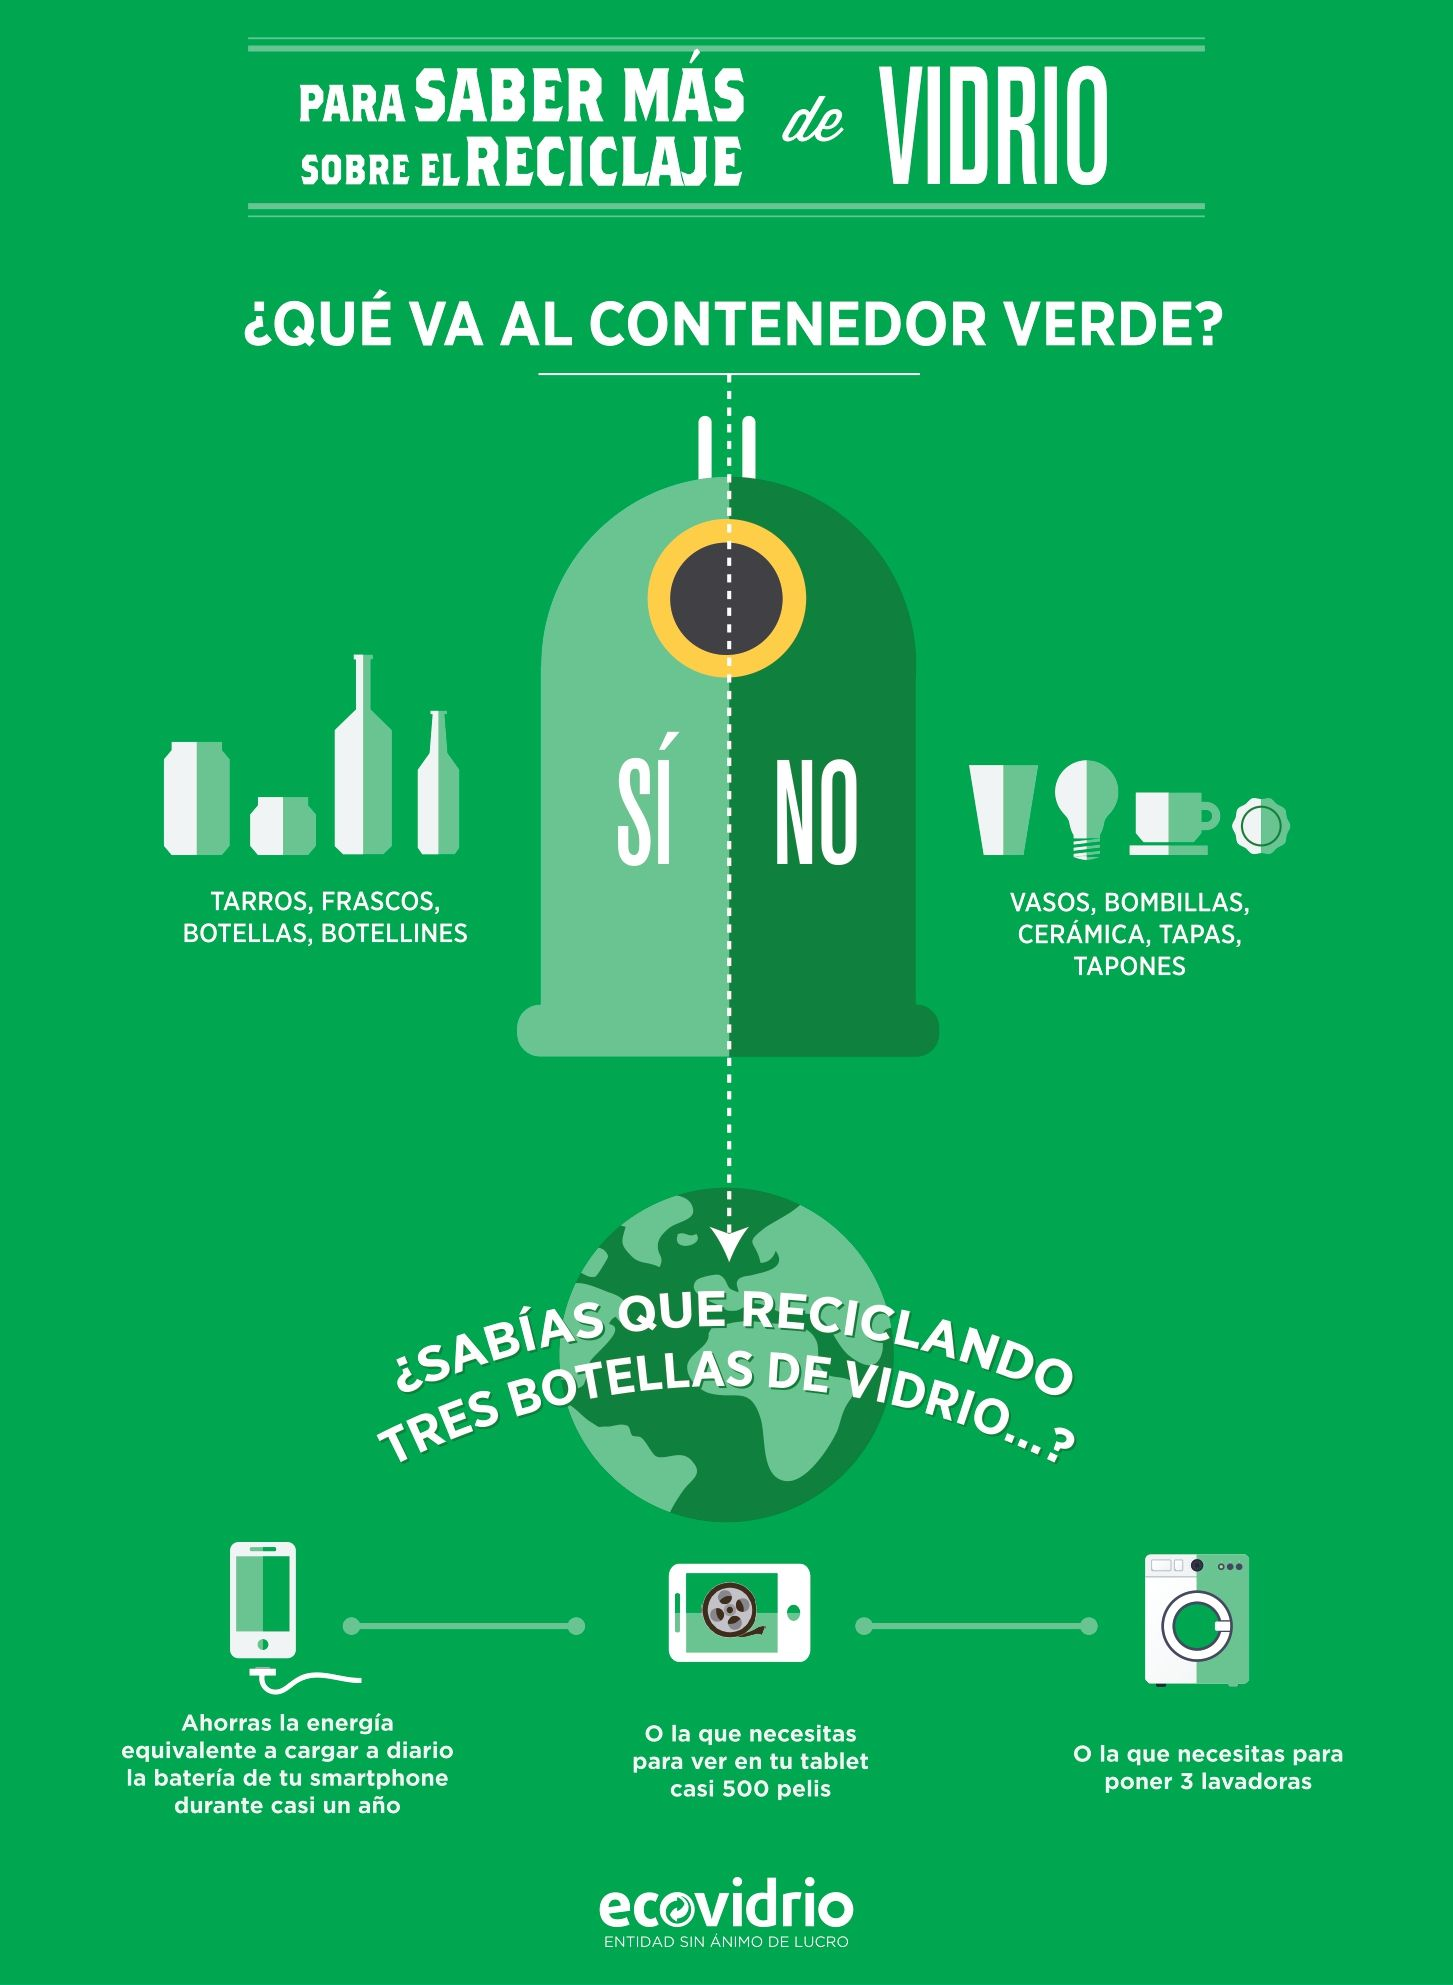 sostenibilidad-reciclaje-barcelona-ecovidrio3